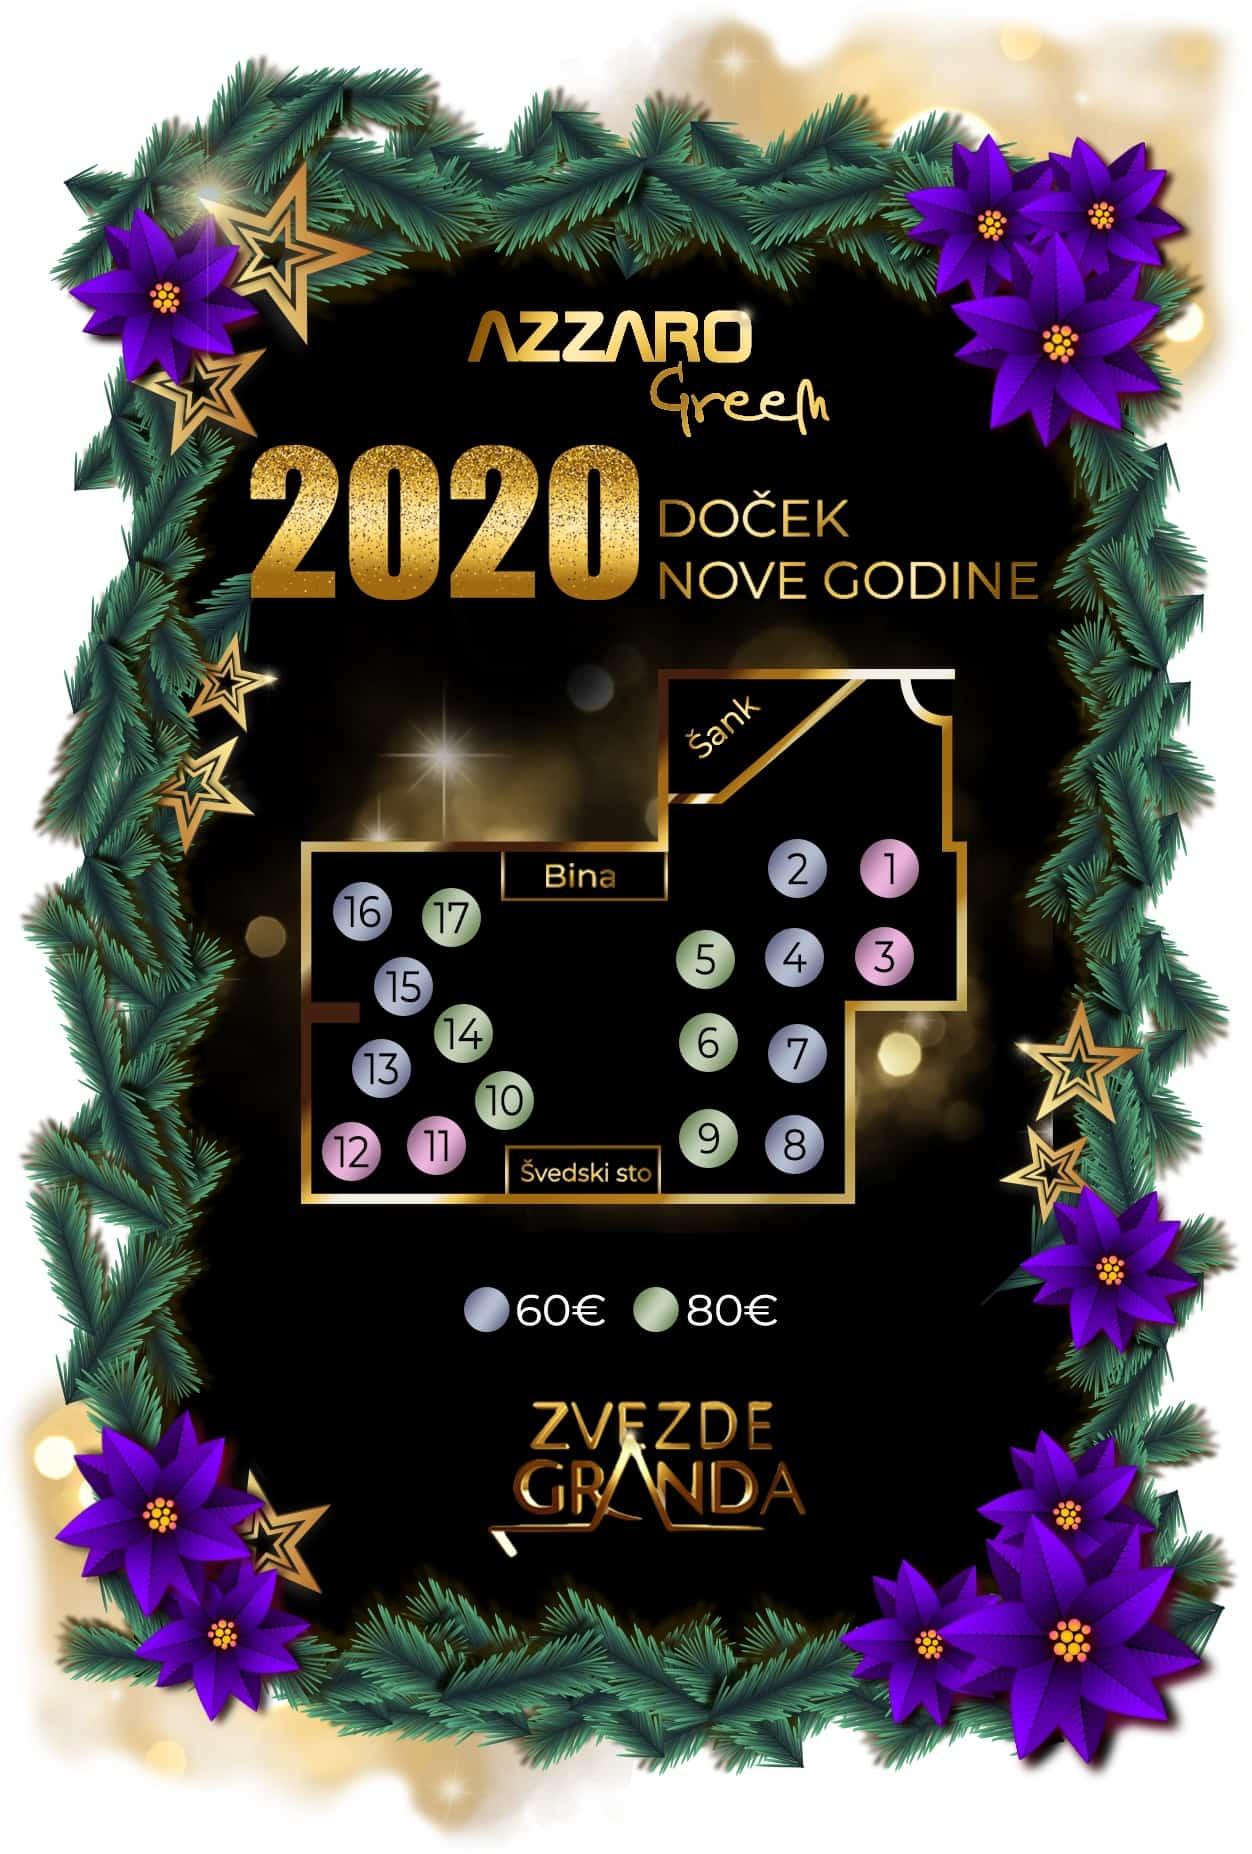 Docek Nove godine 2020 Beograd Restoran Jezero by Azzaro Ada Ciganlija mapa 3